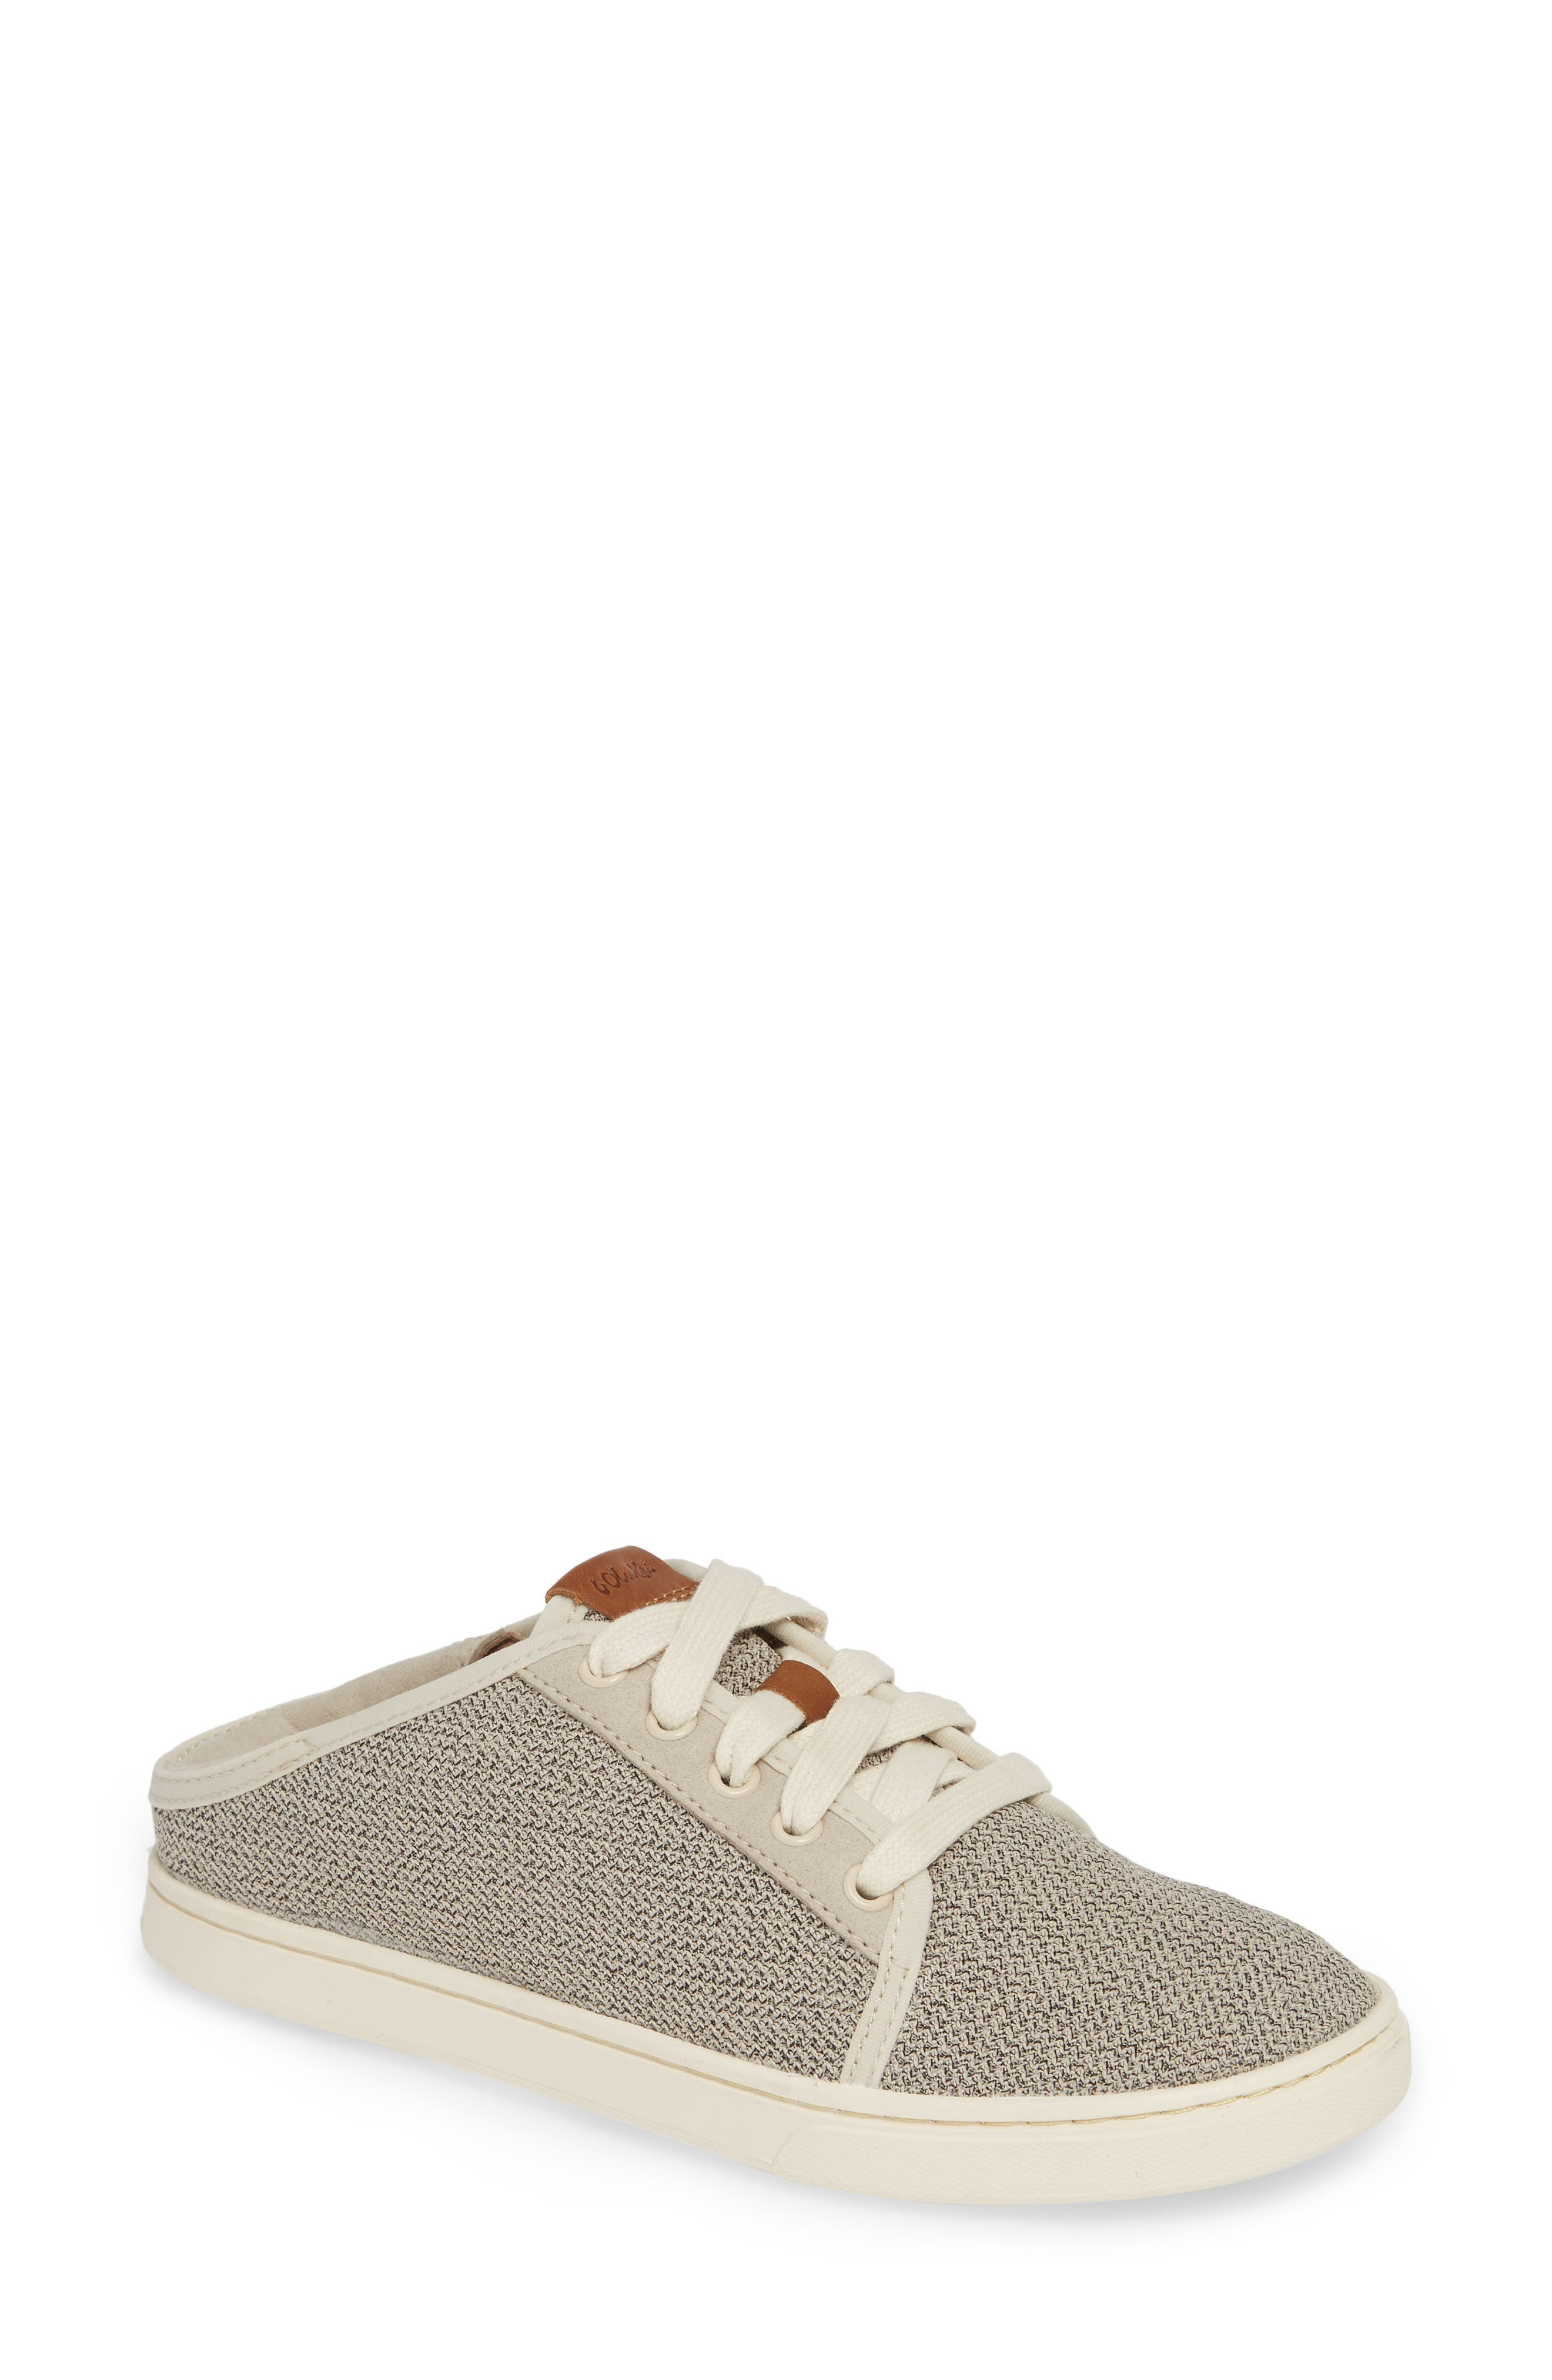 Olukai Pehuea Li Convertible Sneaker- Beige